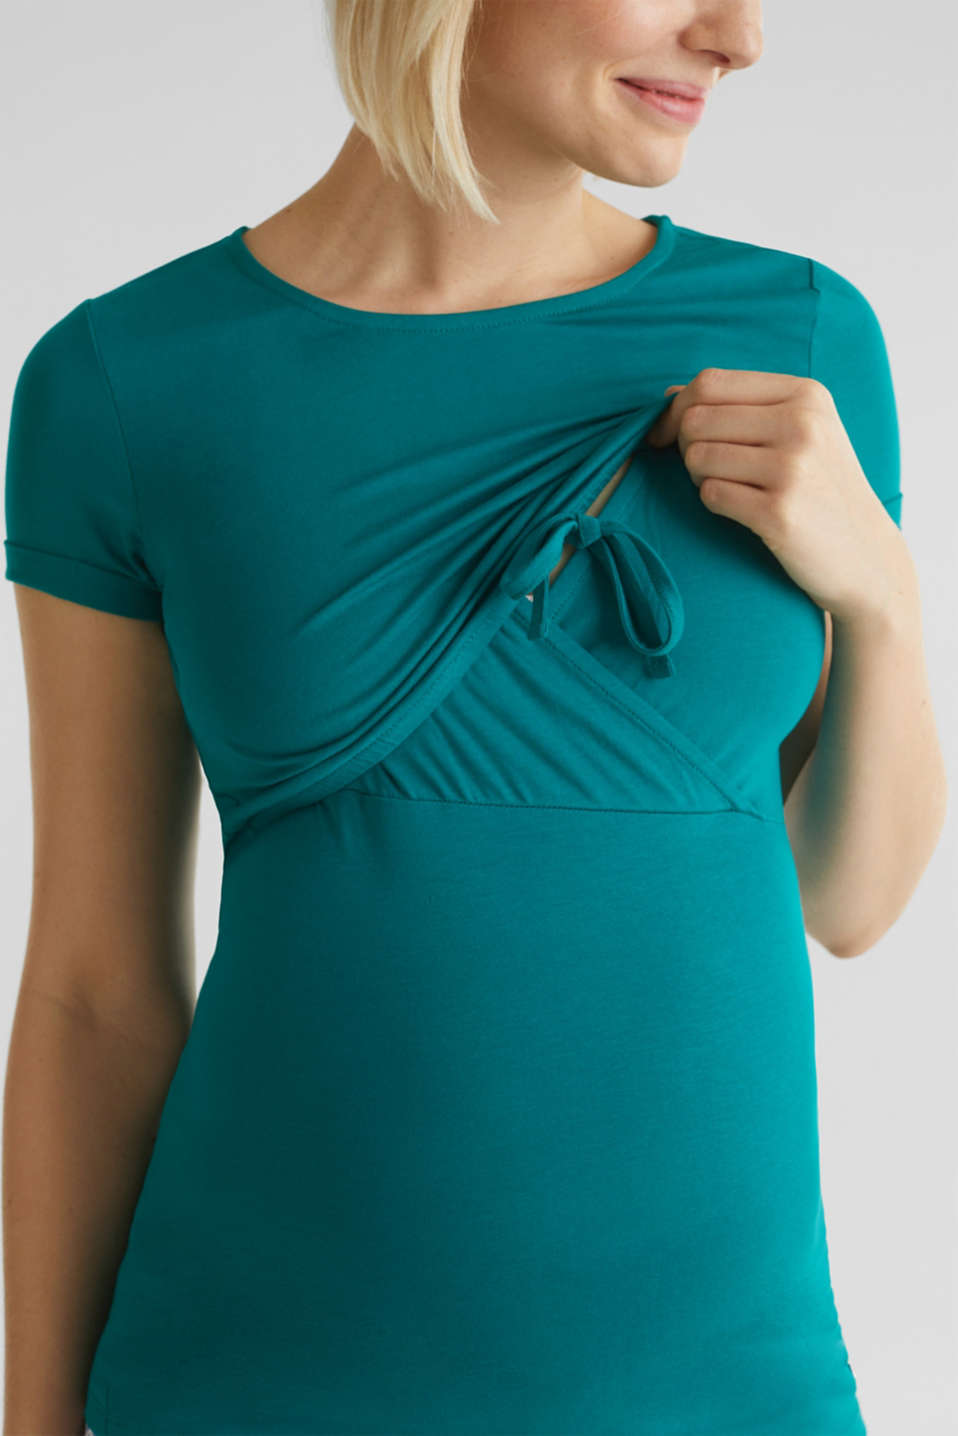 Stretch jersey nursing T-shirt, LCTEAL GREEN, detail image number 5